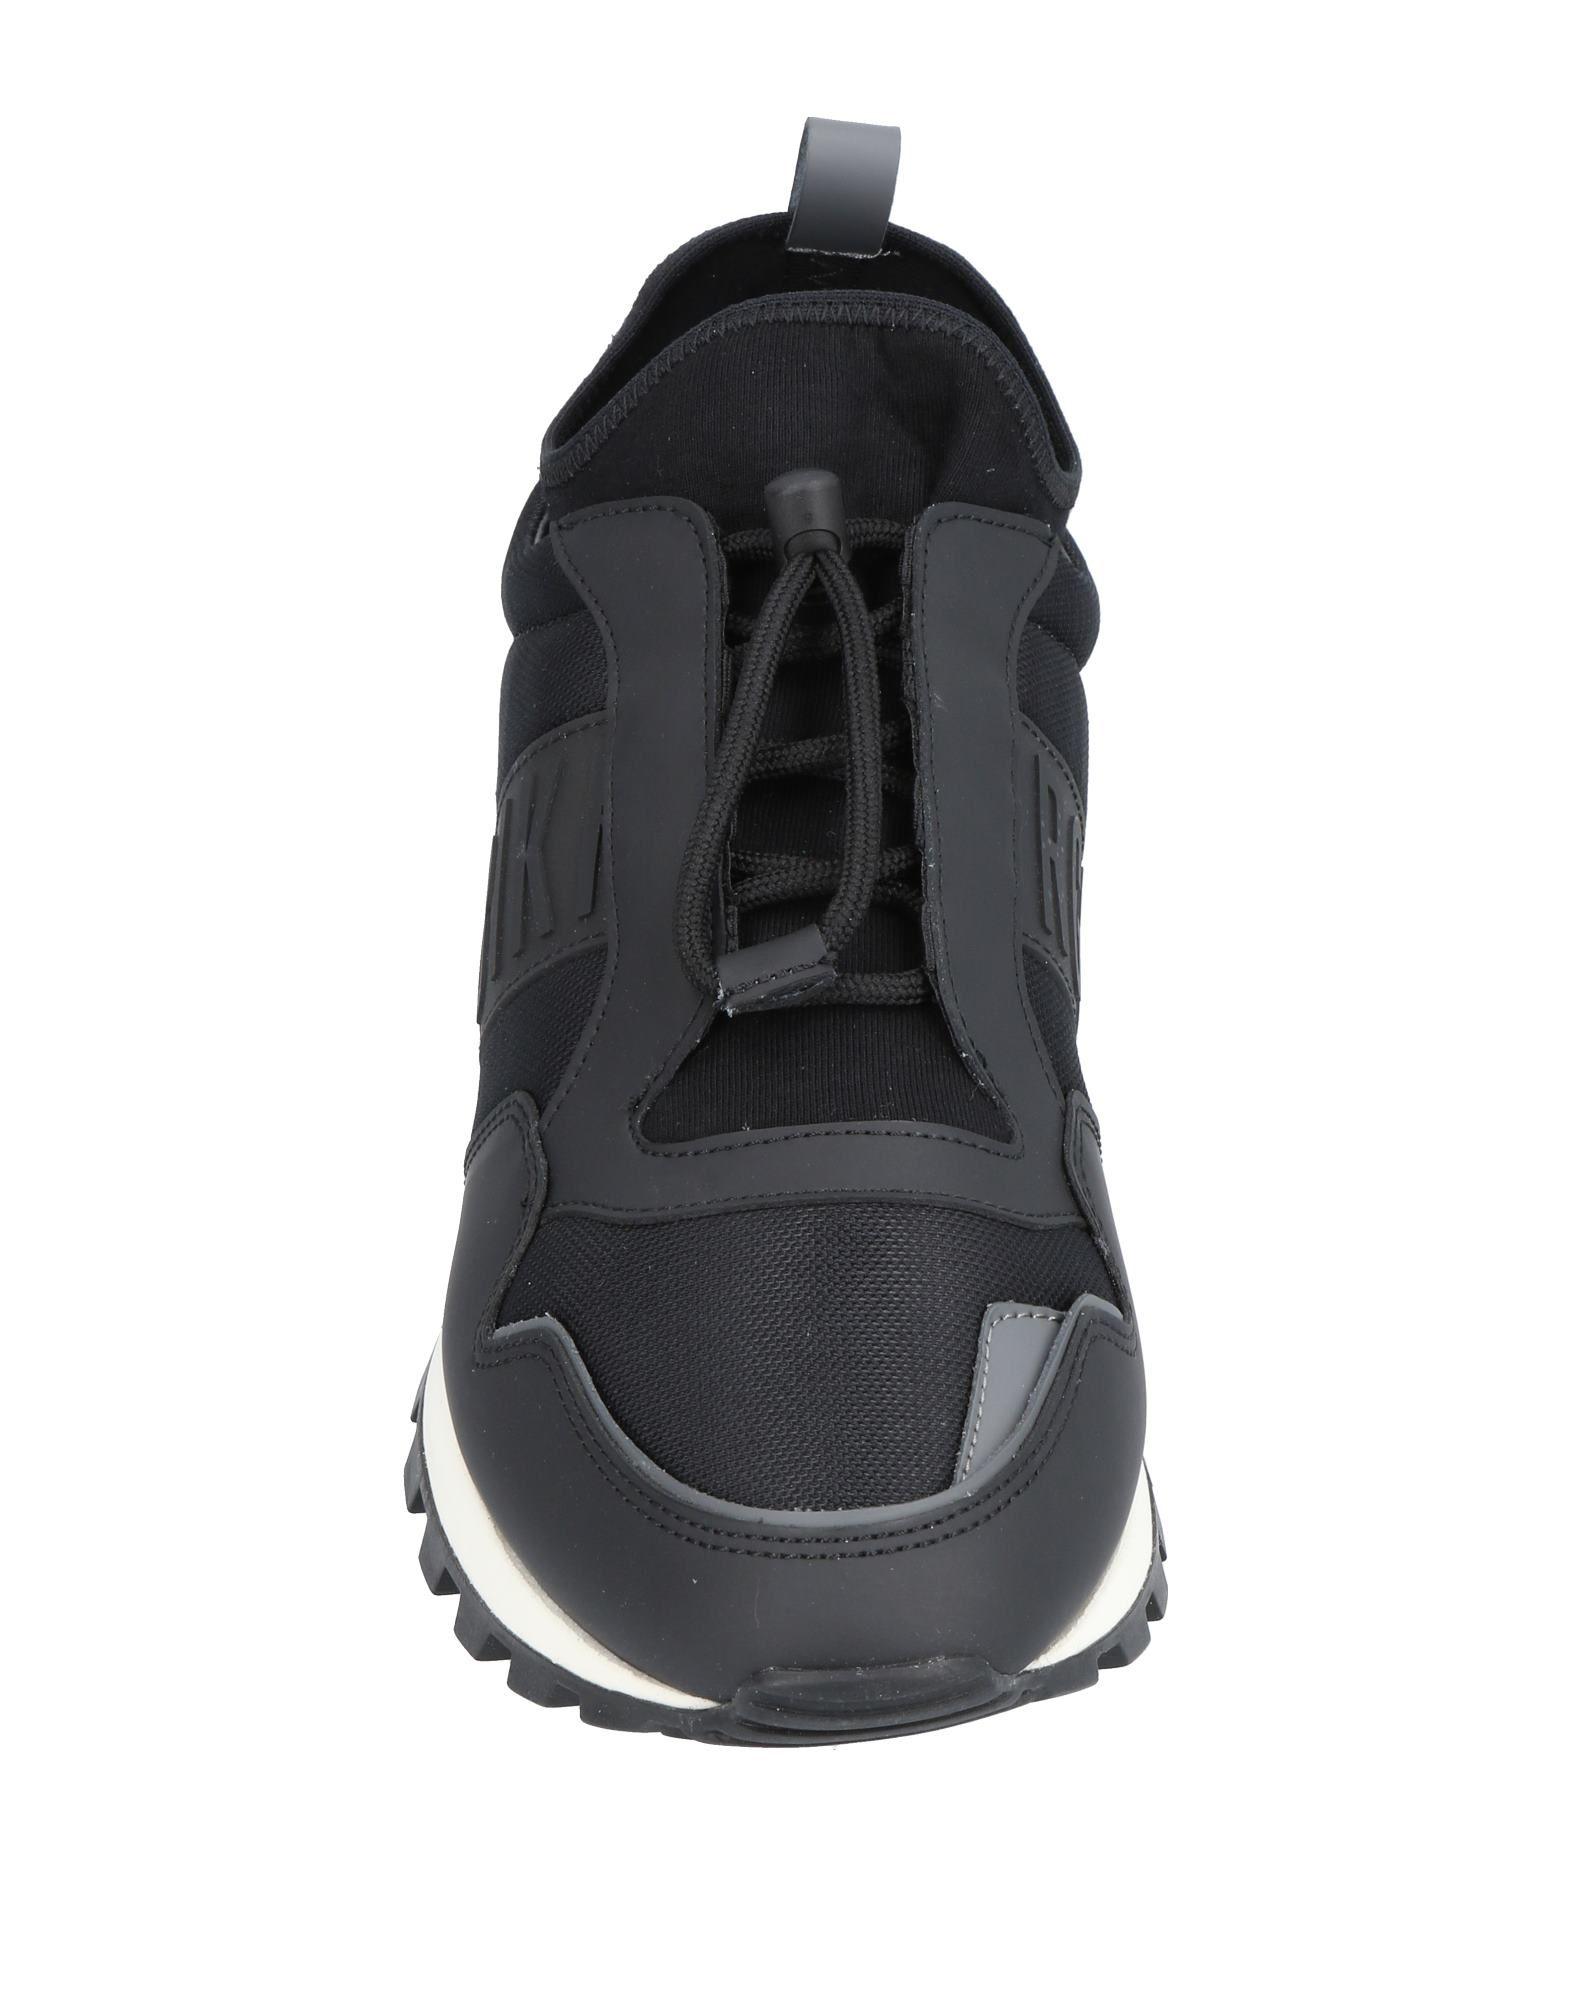 A buon mercato Sneakers Bikkembergs Uomo - 11449949DK